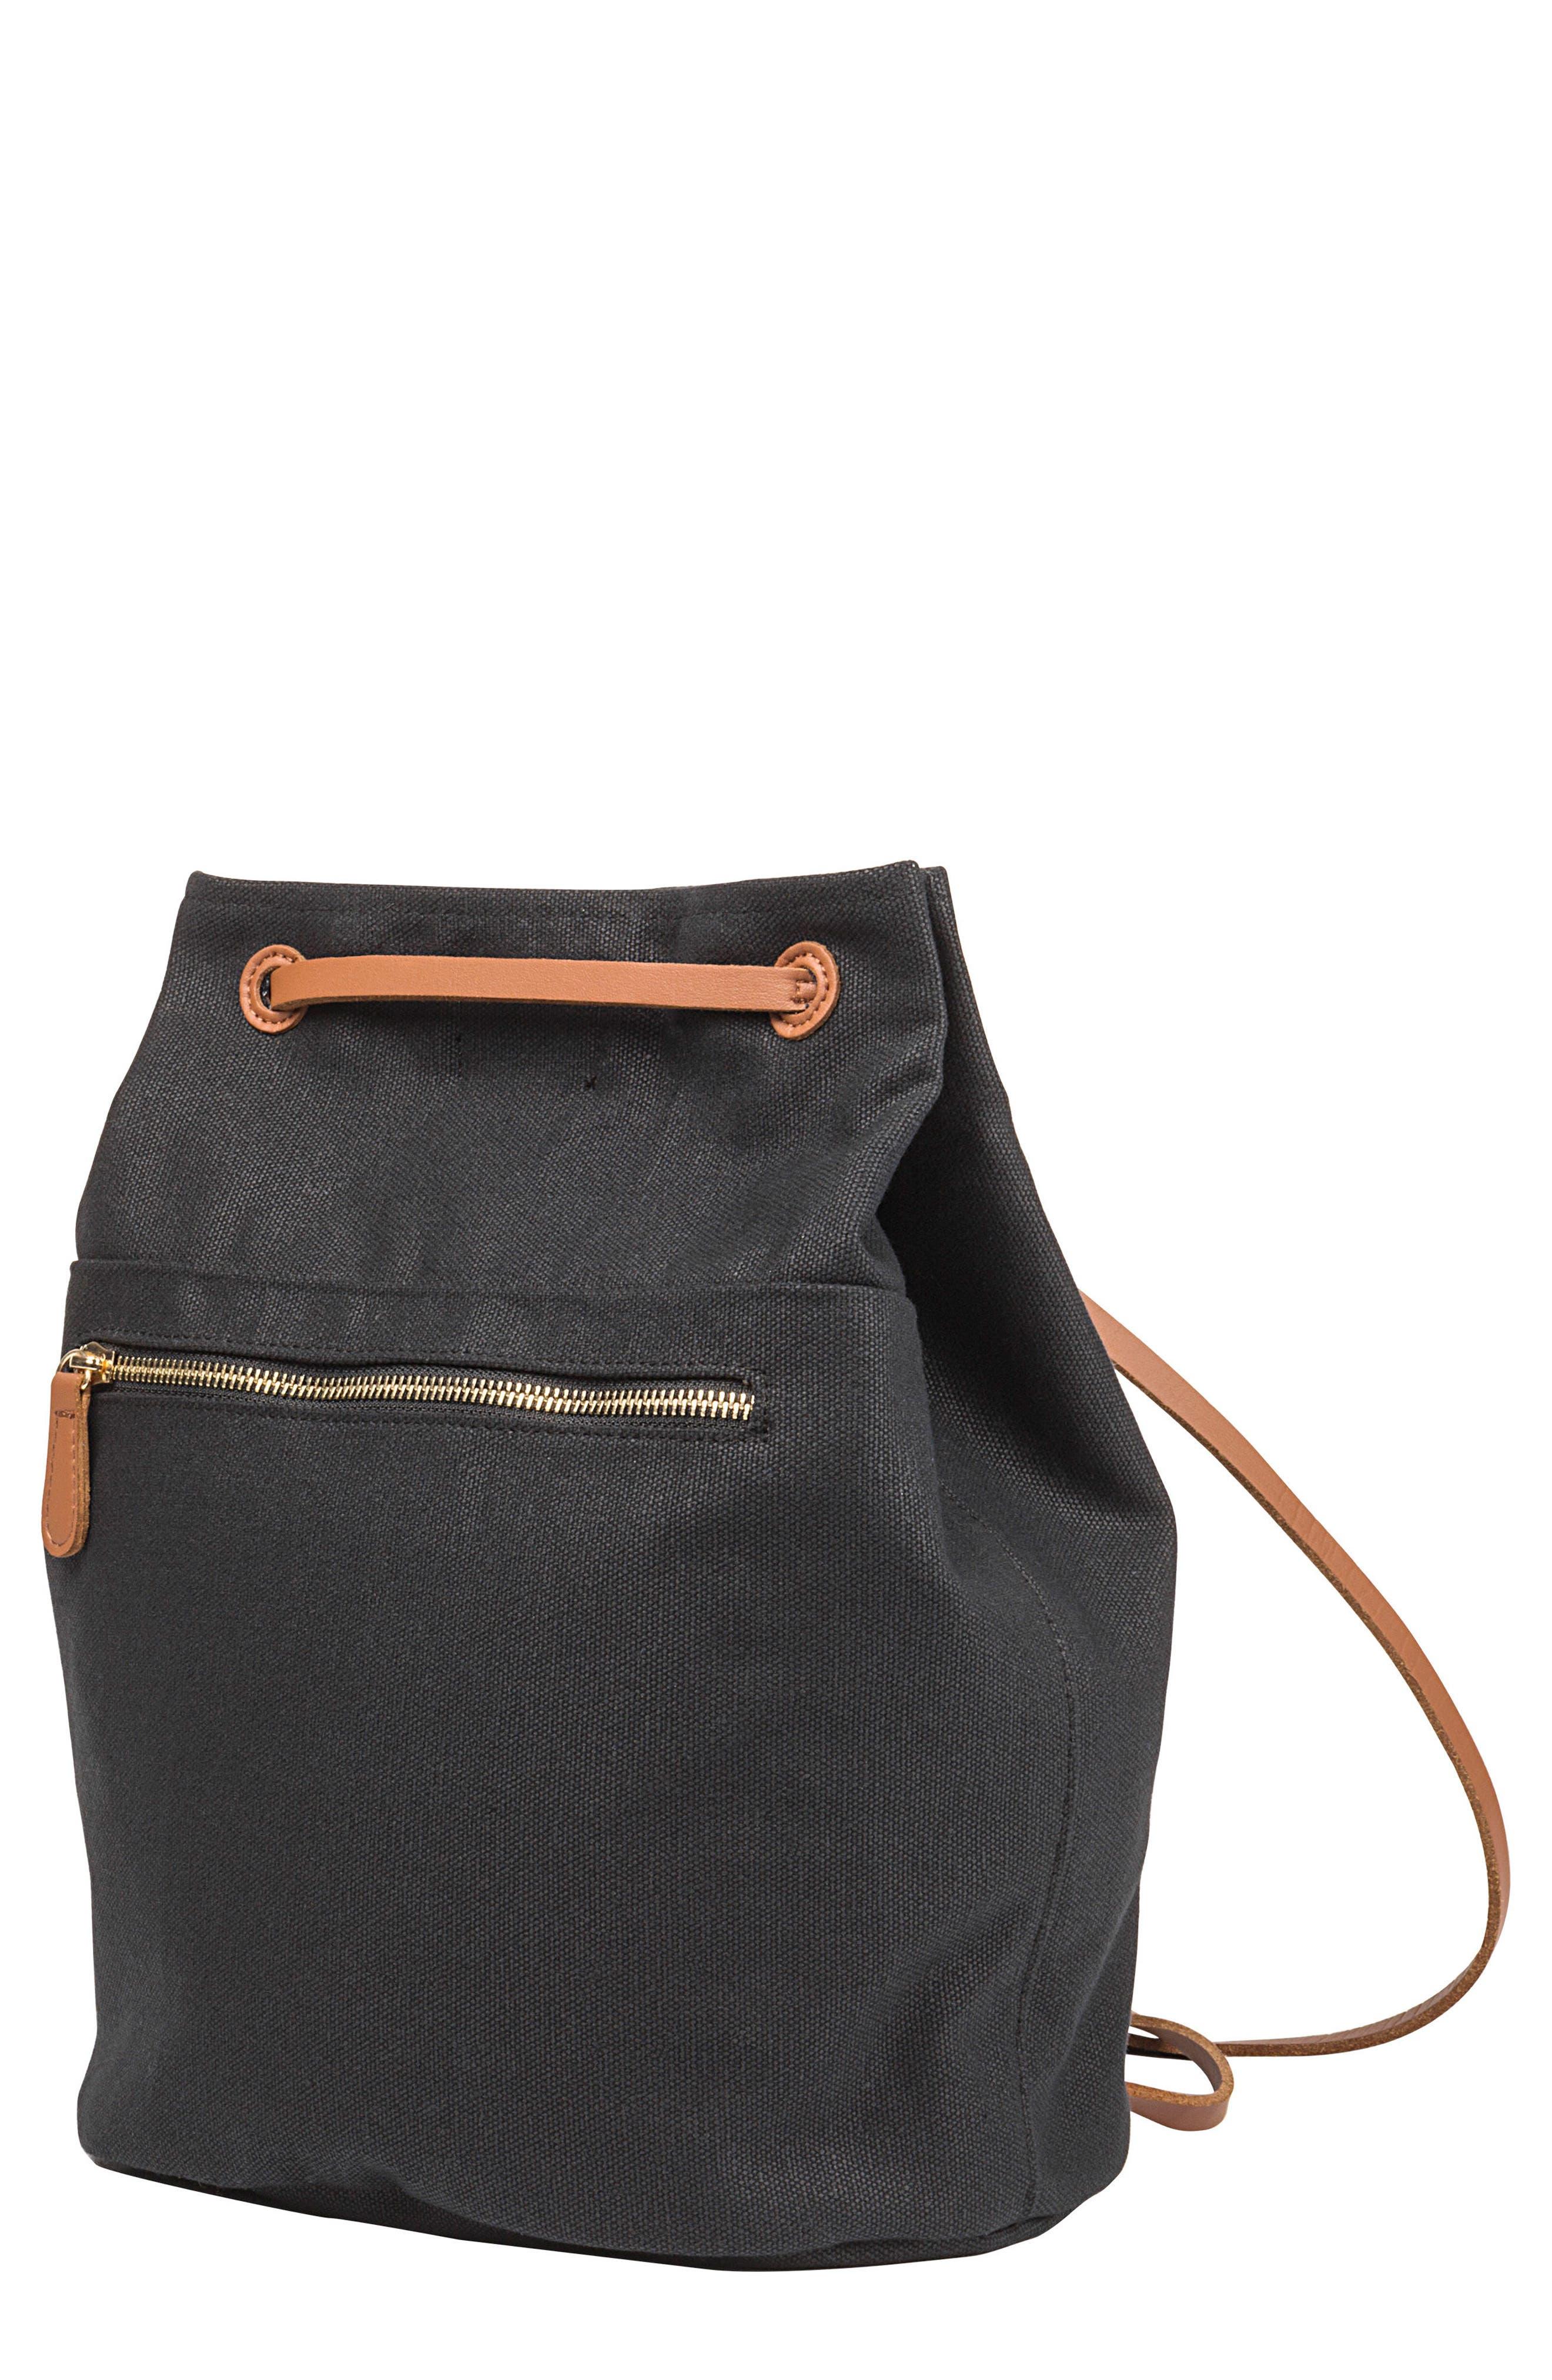 Monogram Convertible Backpack,                             Main thumbnail 1, color,                             001